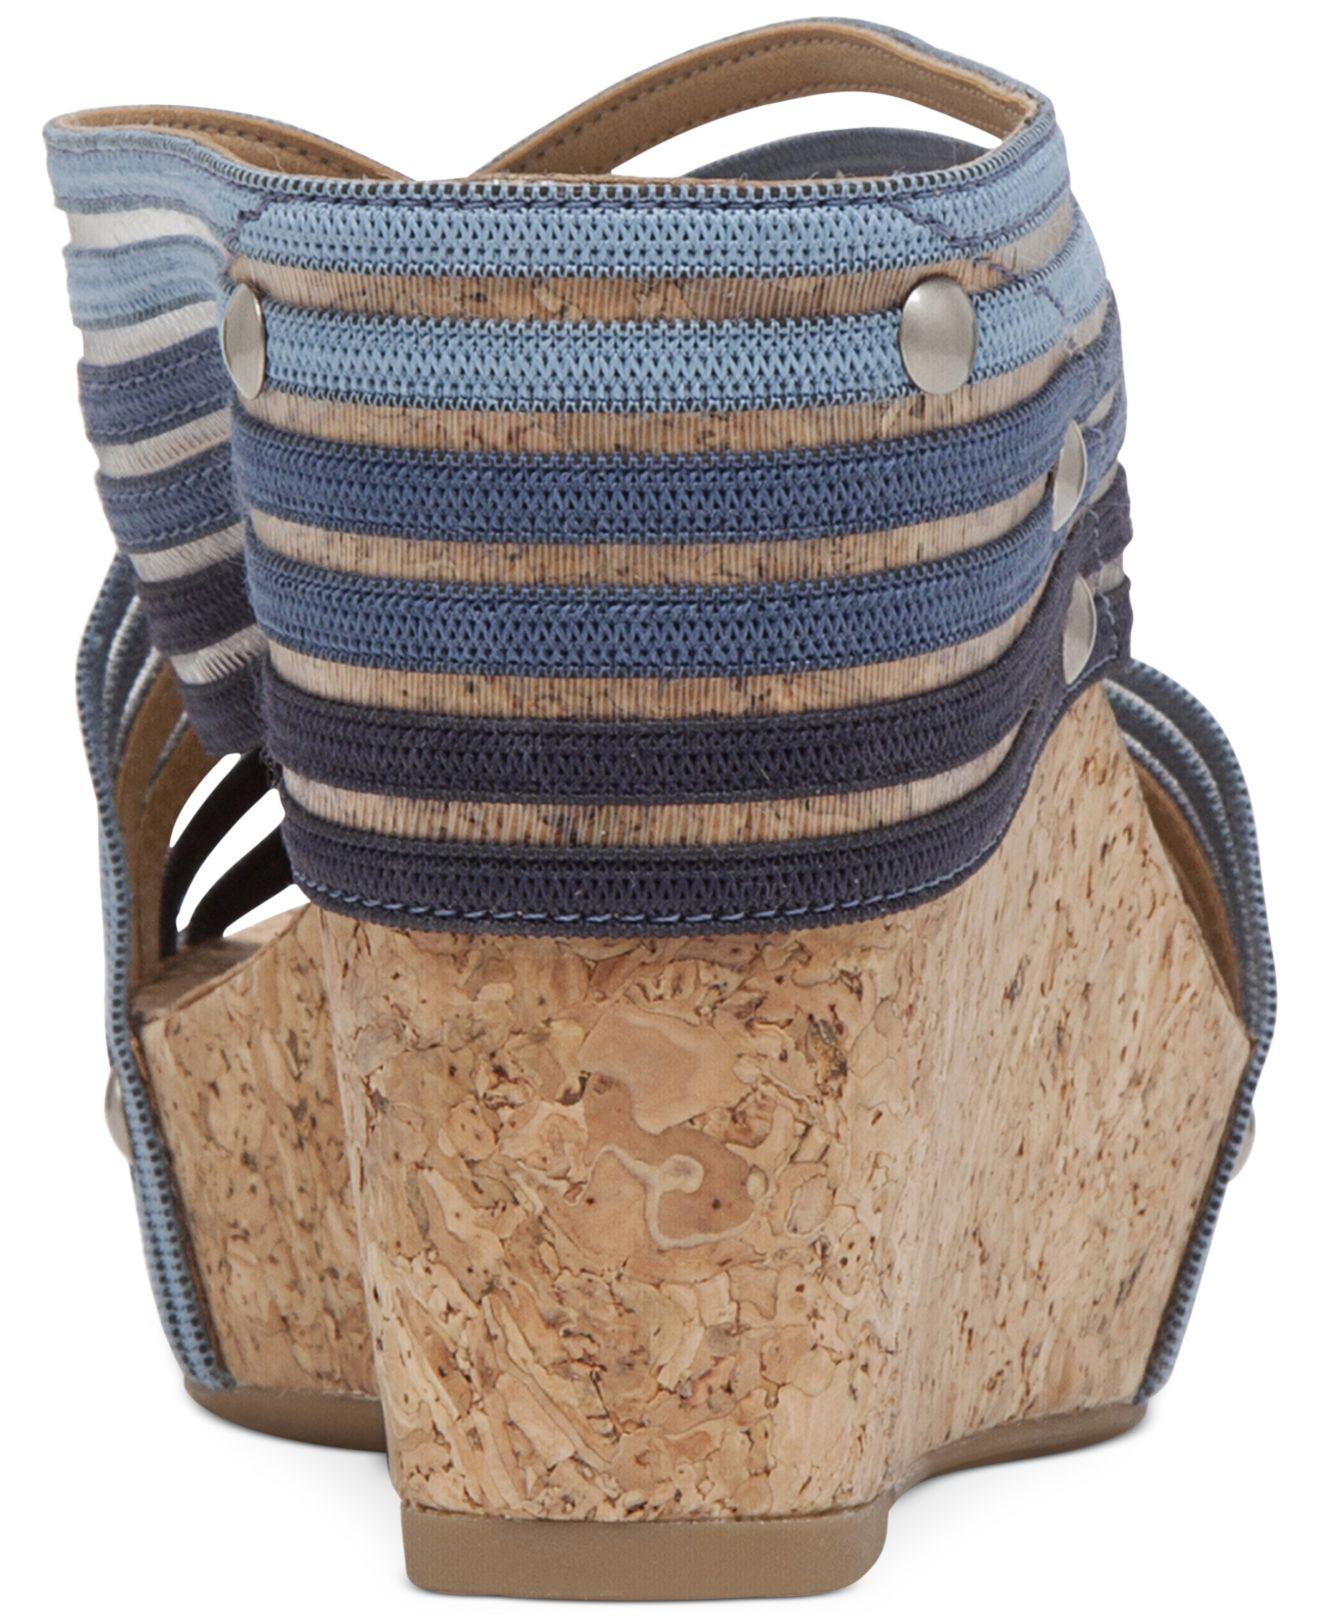 c49c1e6d0 Lyst - Lucky Brand Miller2 Platform Wedge Sandals in Blue